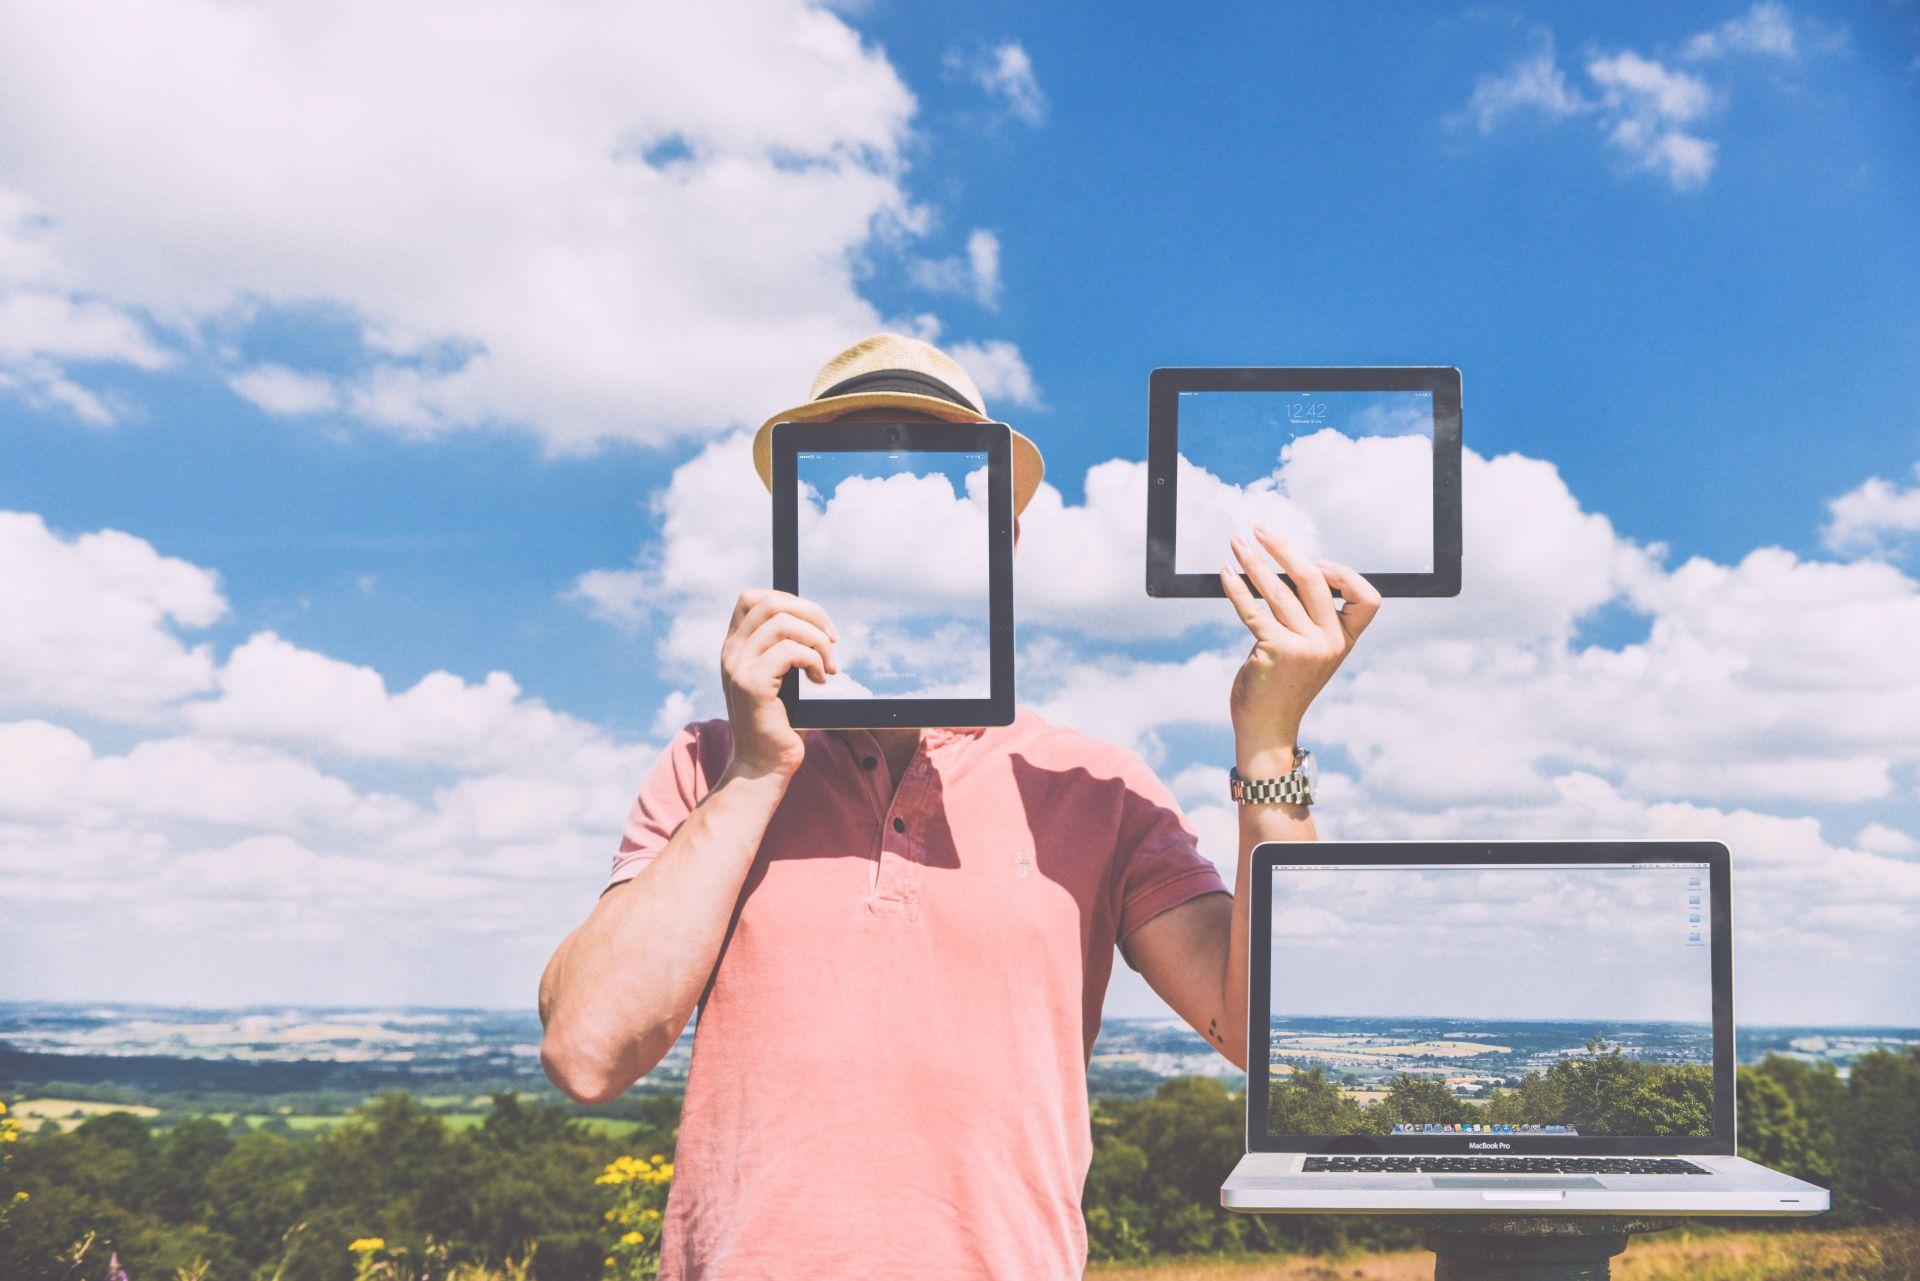 cloud-computing-a-glimpse-to-the-future